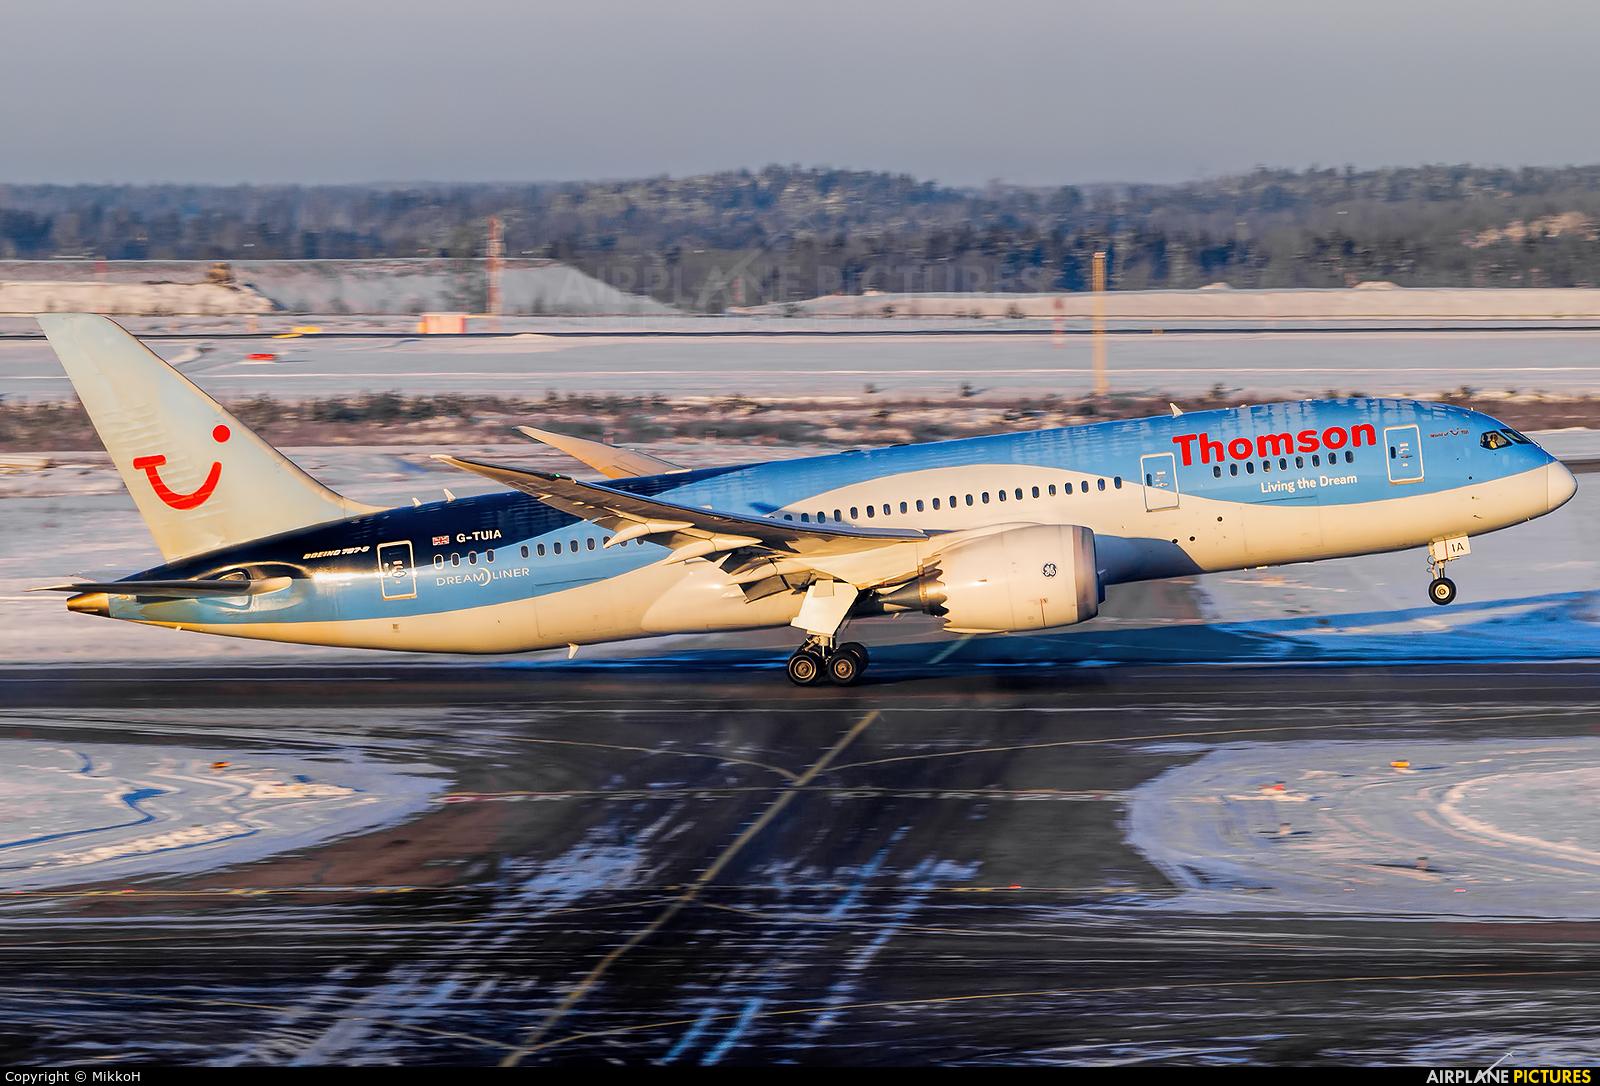 Thomson/Thomsonfly G-TUIA aircraft at Helsinki - Vantaa